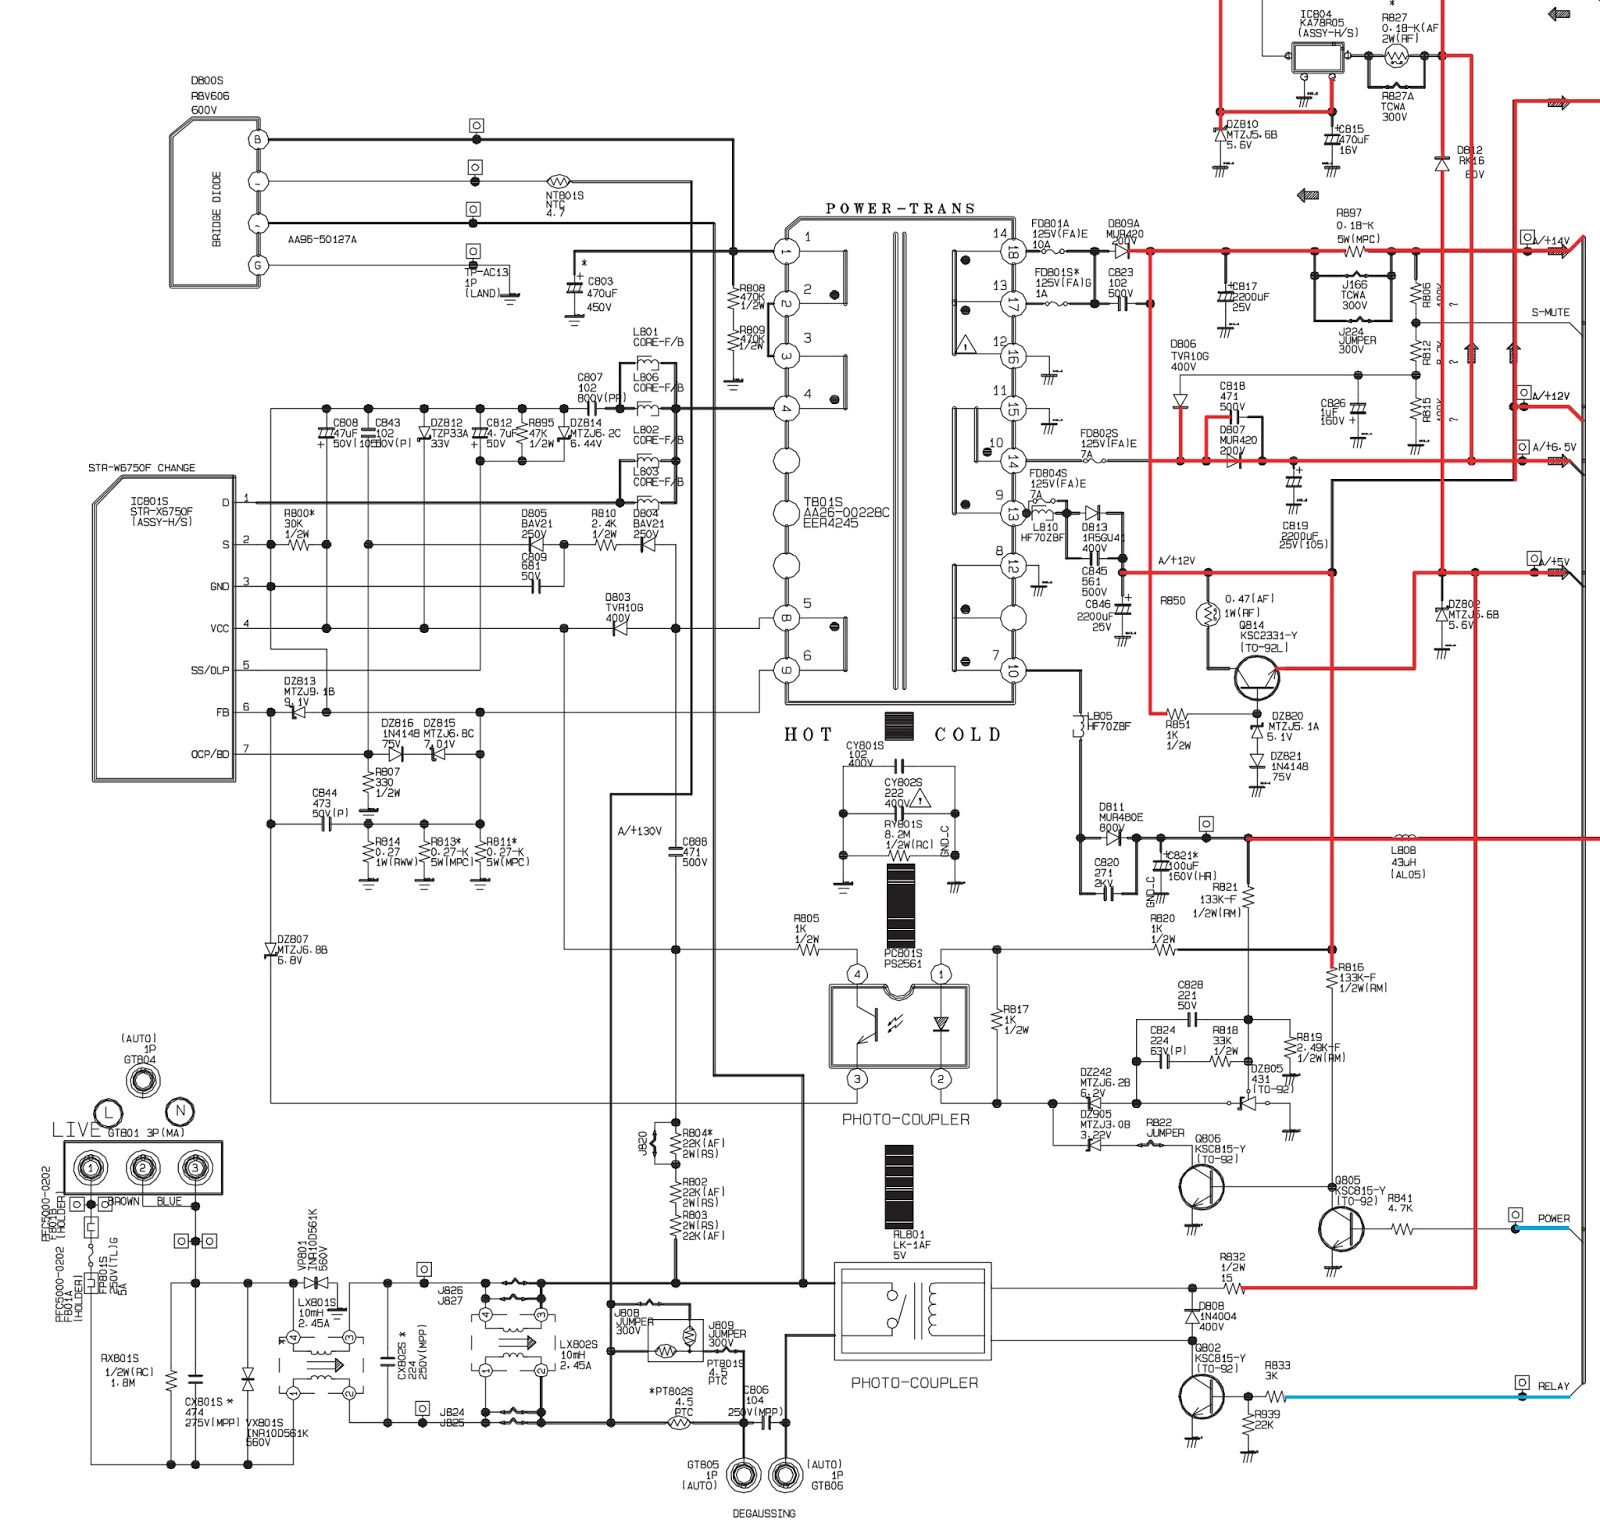 smps schematic diagram sonos playbar wiring samsung cl29x50 power supply circuit